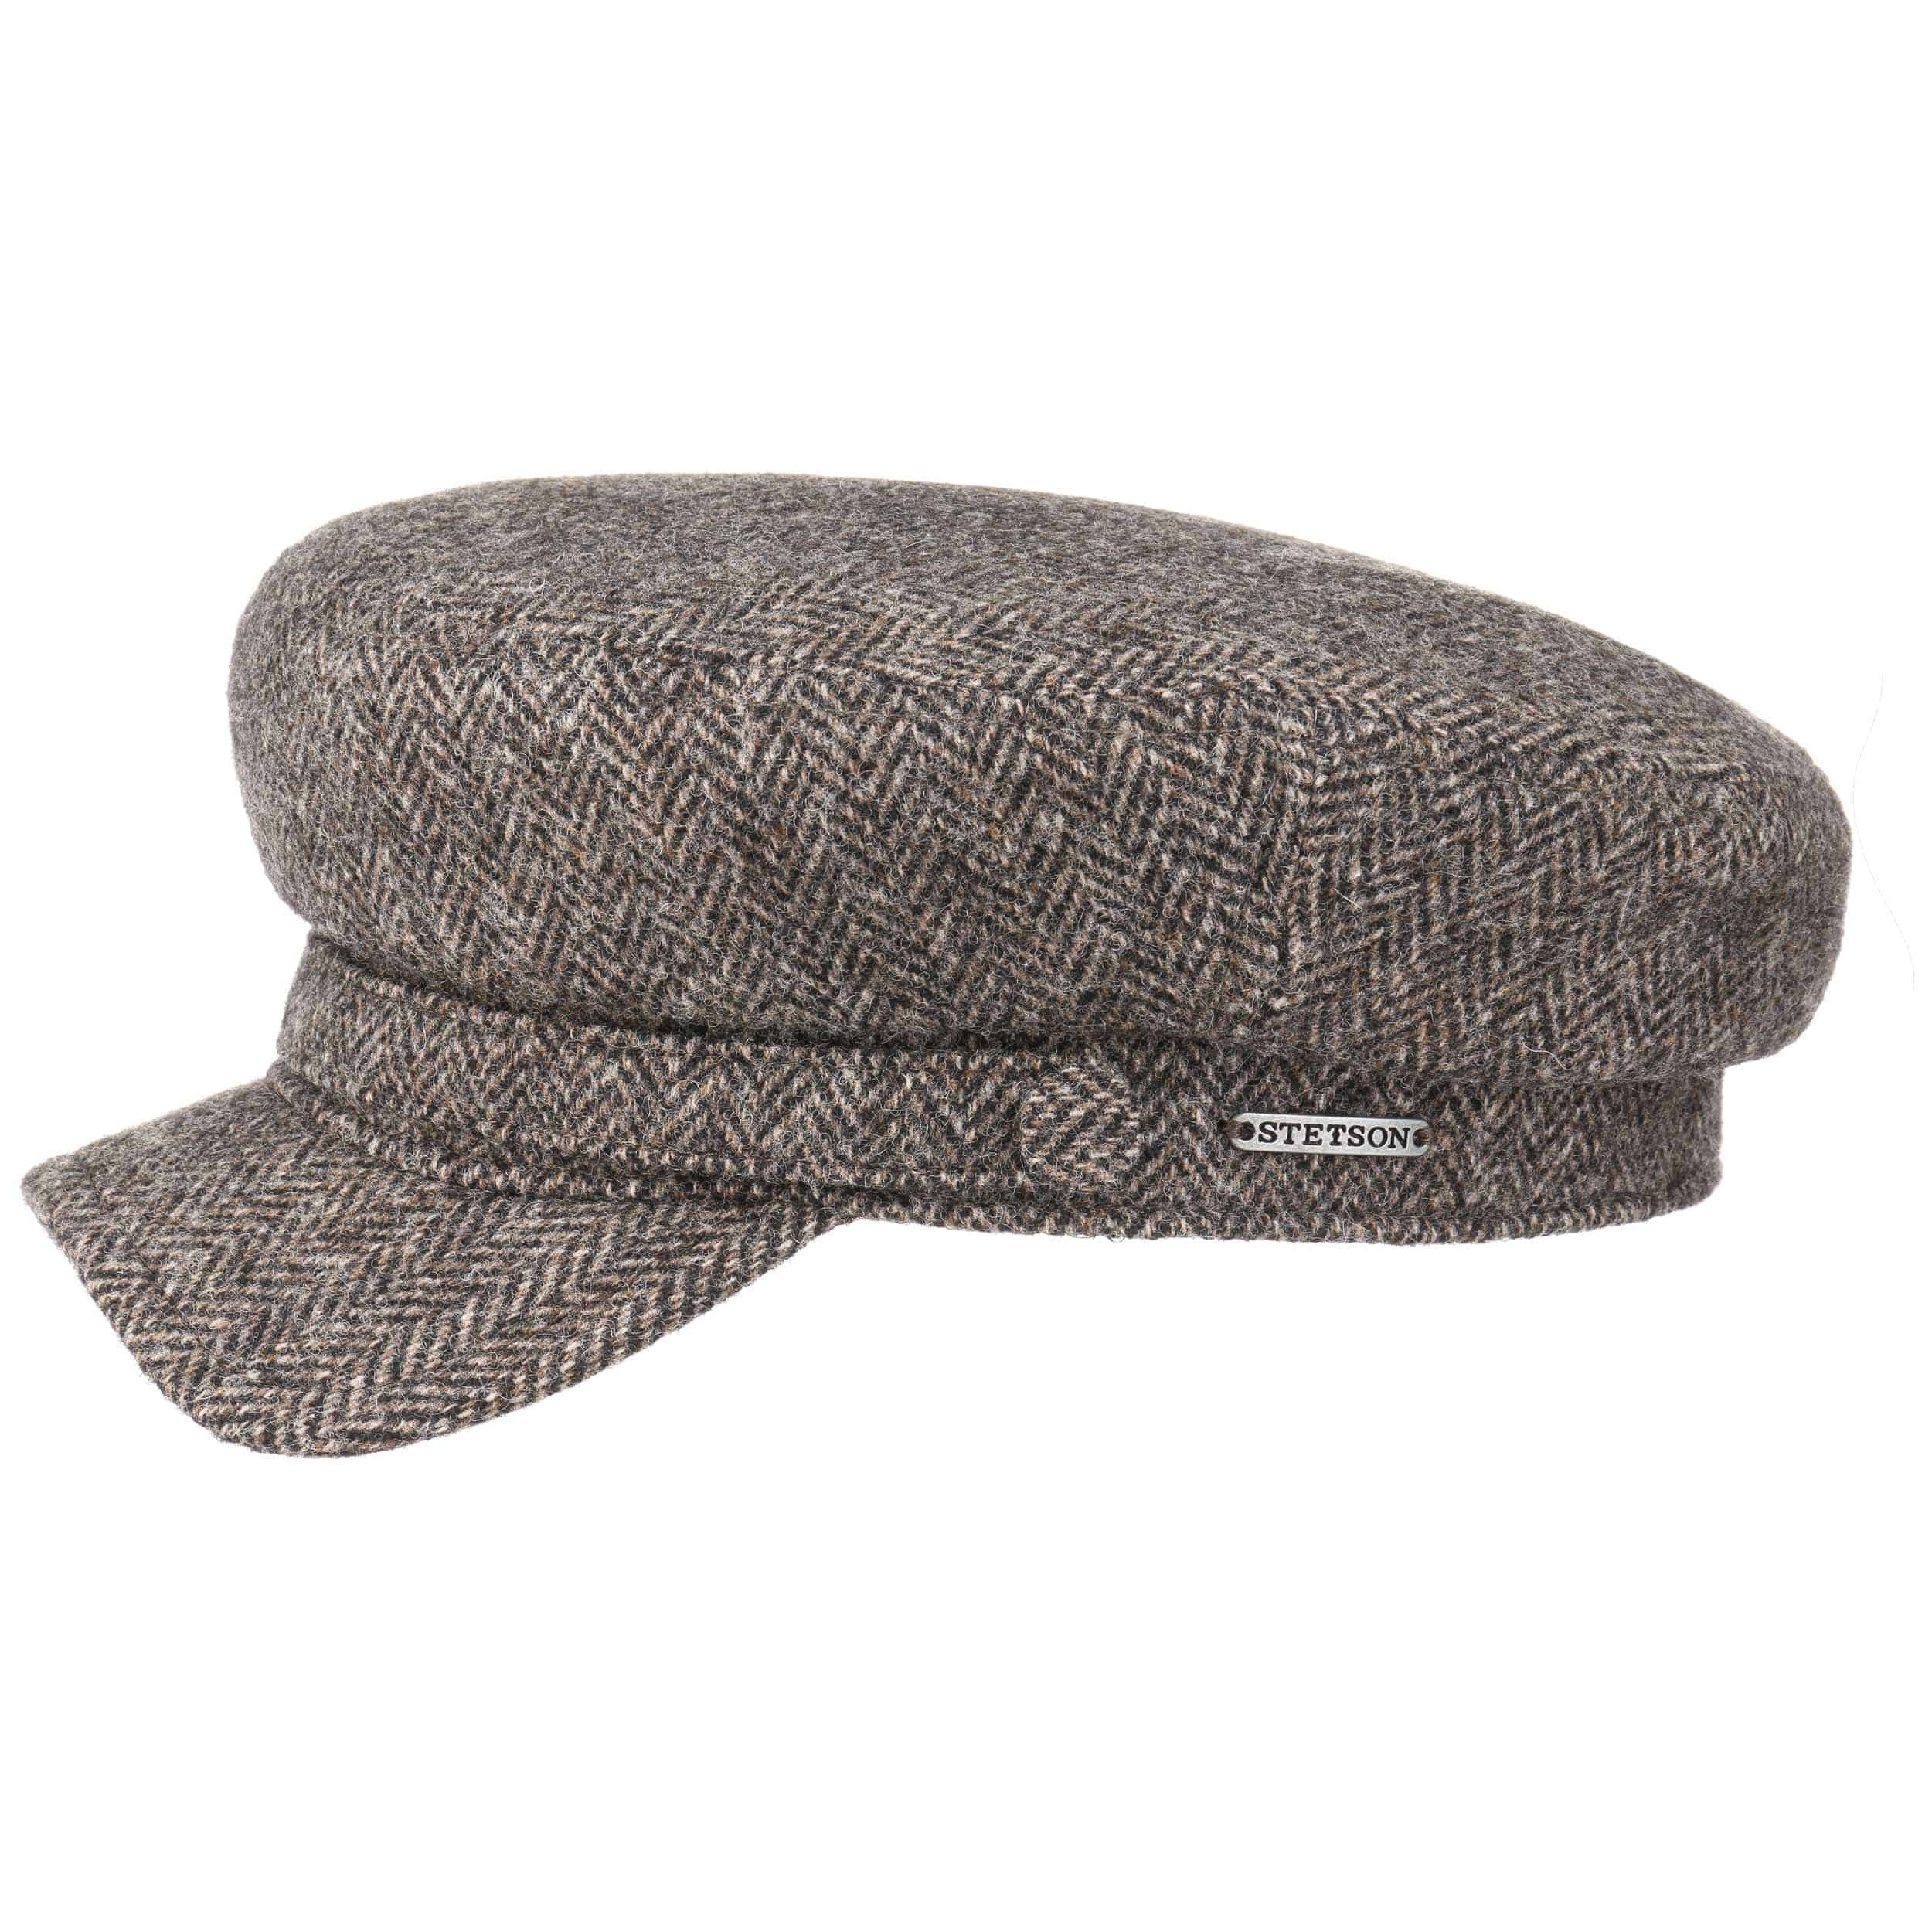 Gorra Marinera Herringbone Wool by Stetson - Gorras - sombreroshop.es 628aa5ffc6a